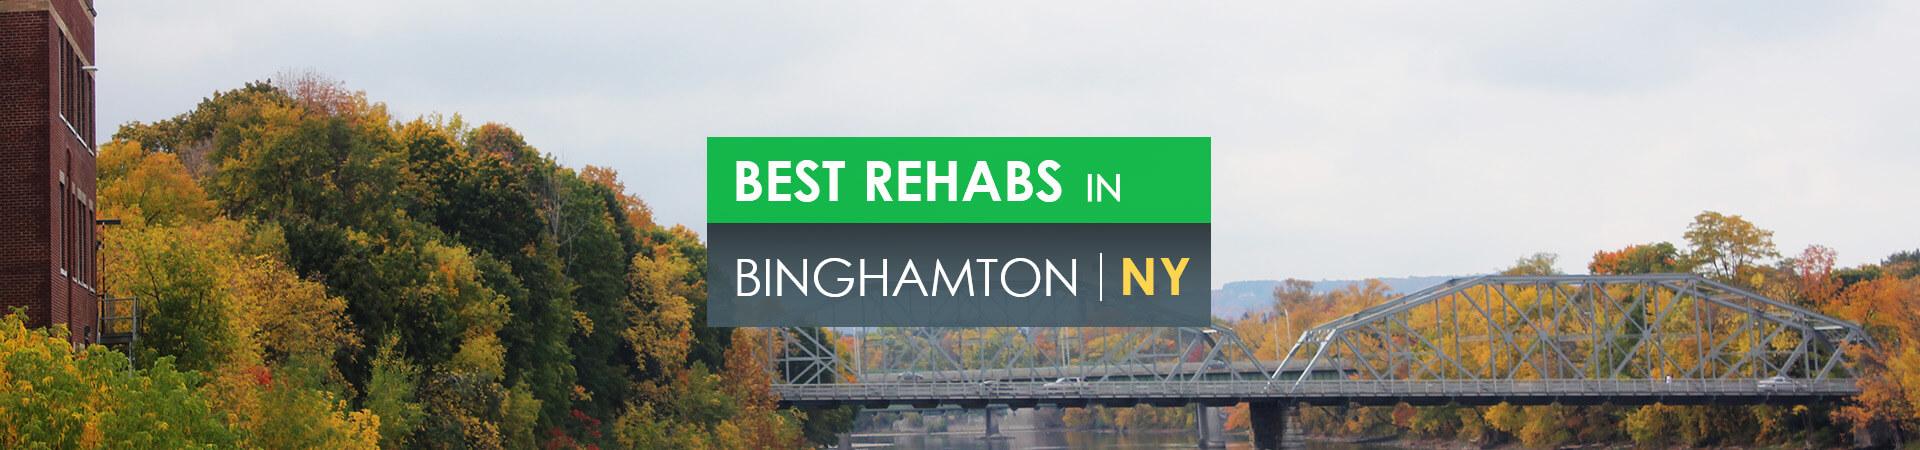 Best rehabs in Binghamton, NY